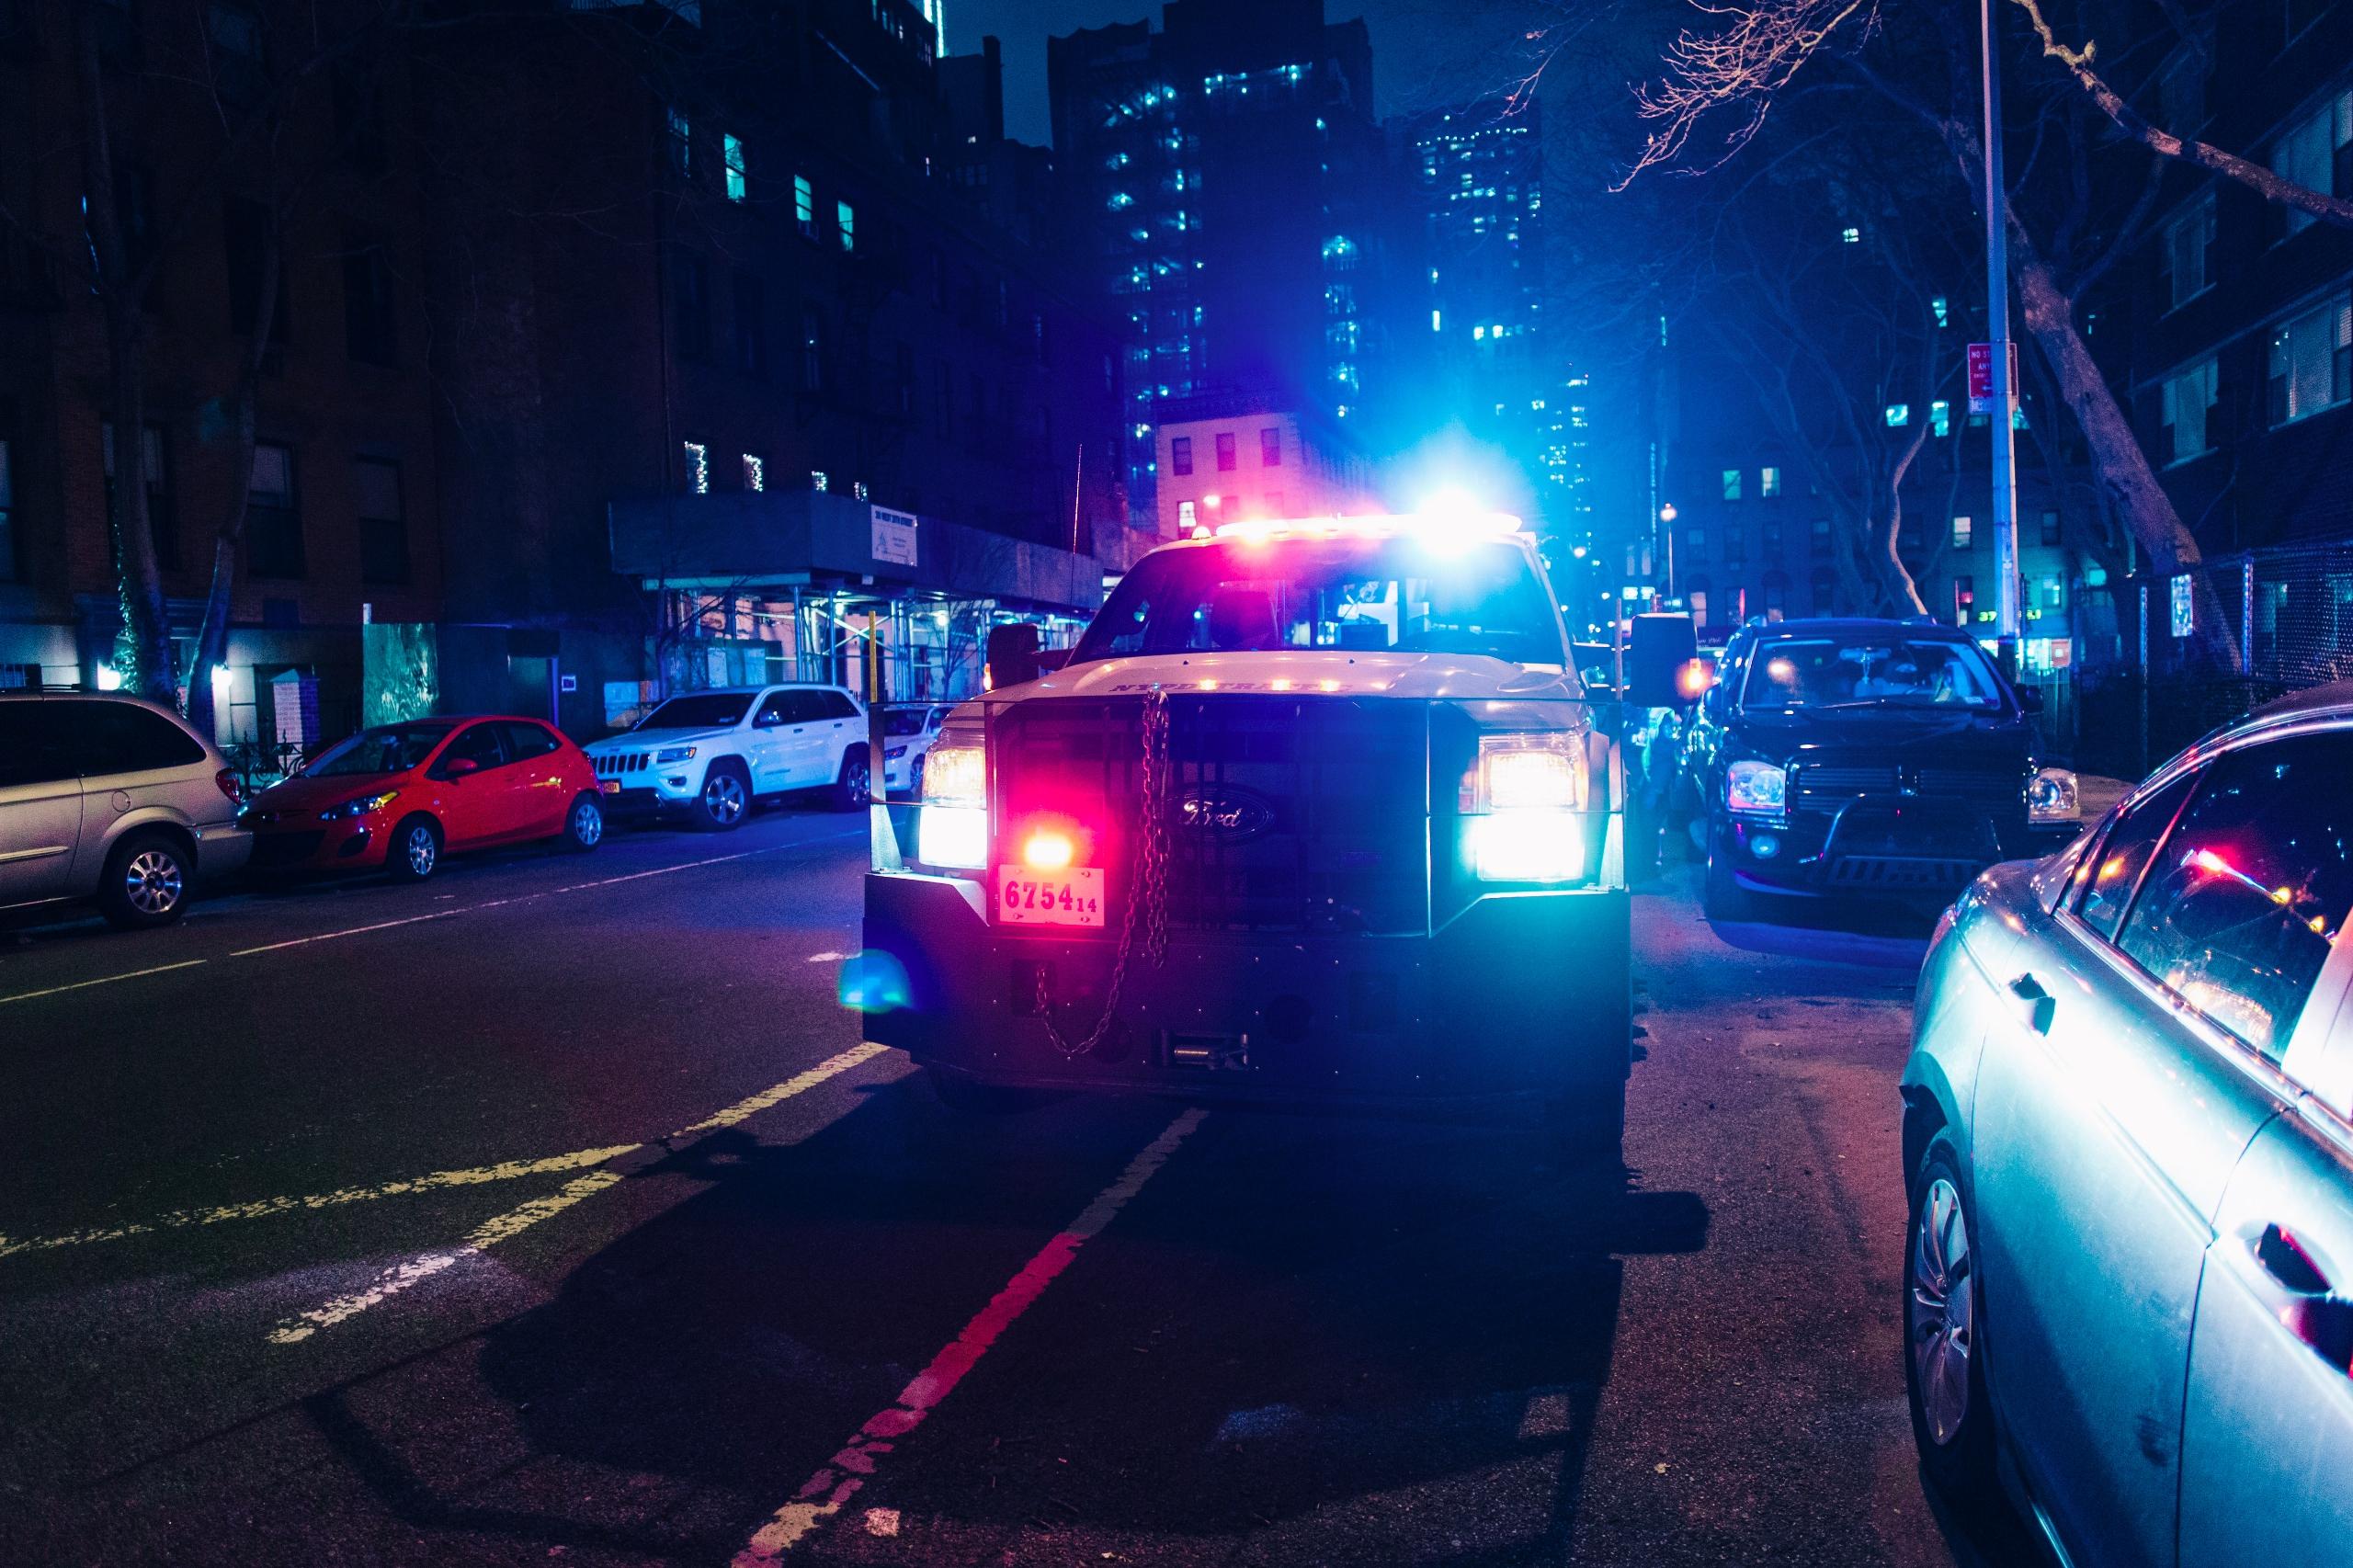 Nightcall - photography, newyork - domreess | ello